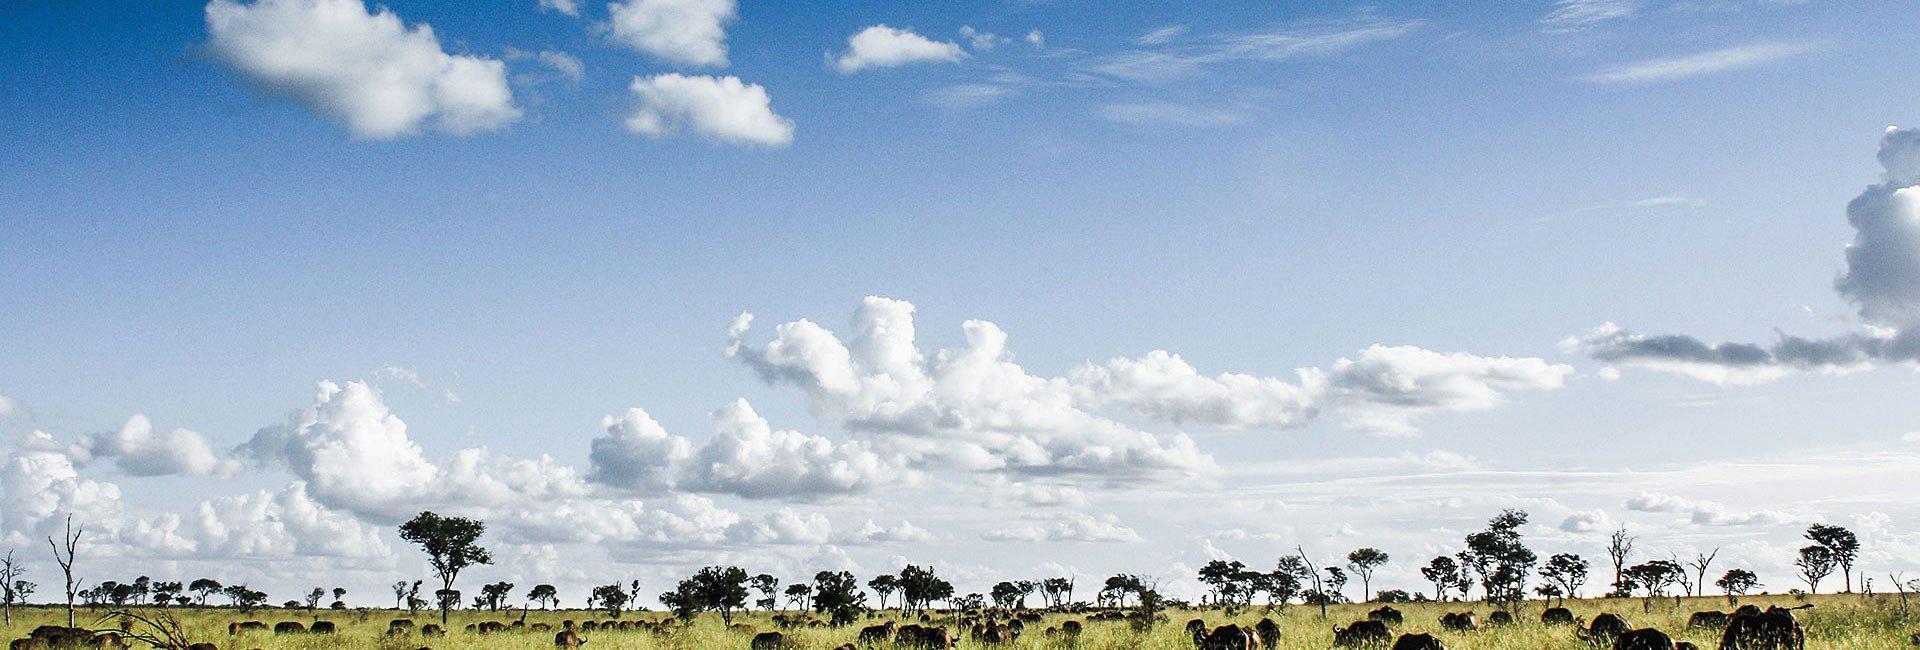 Singita Sabi Sands Kruger Park